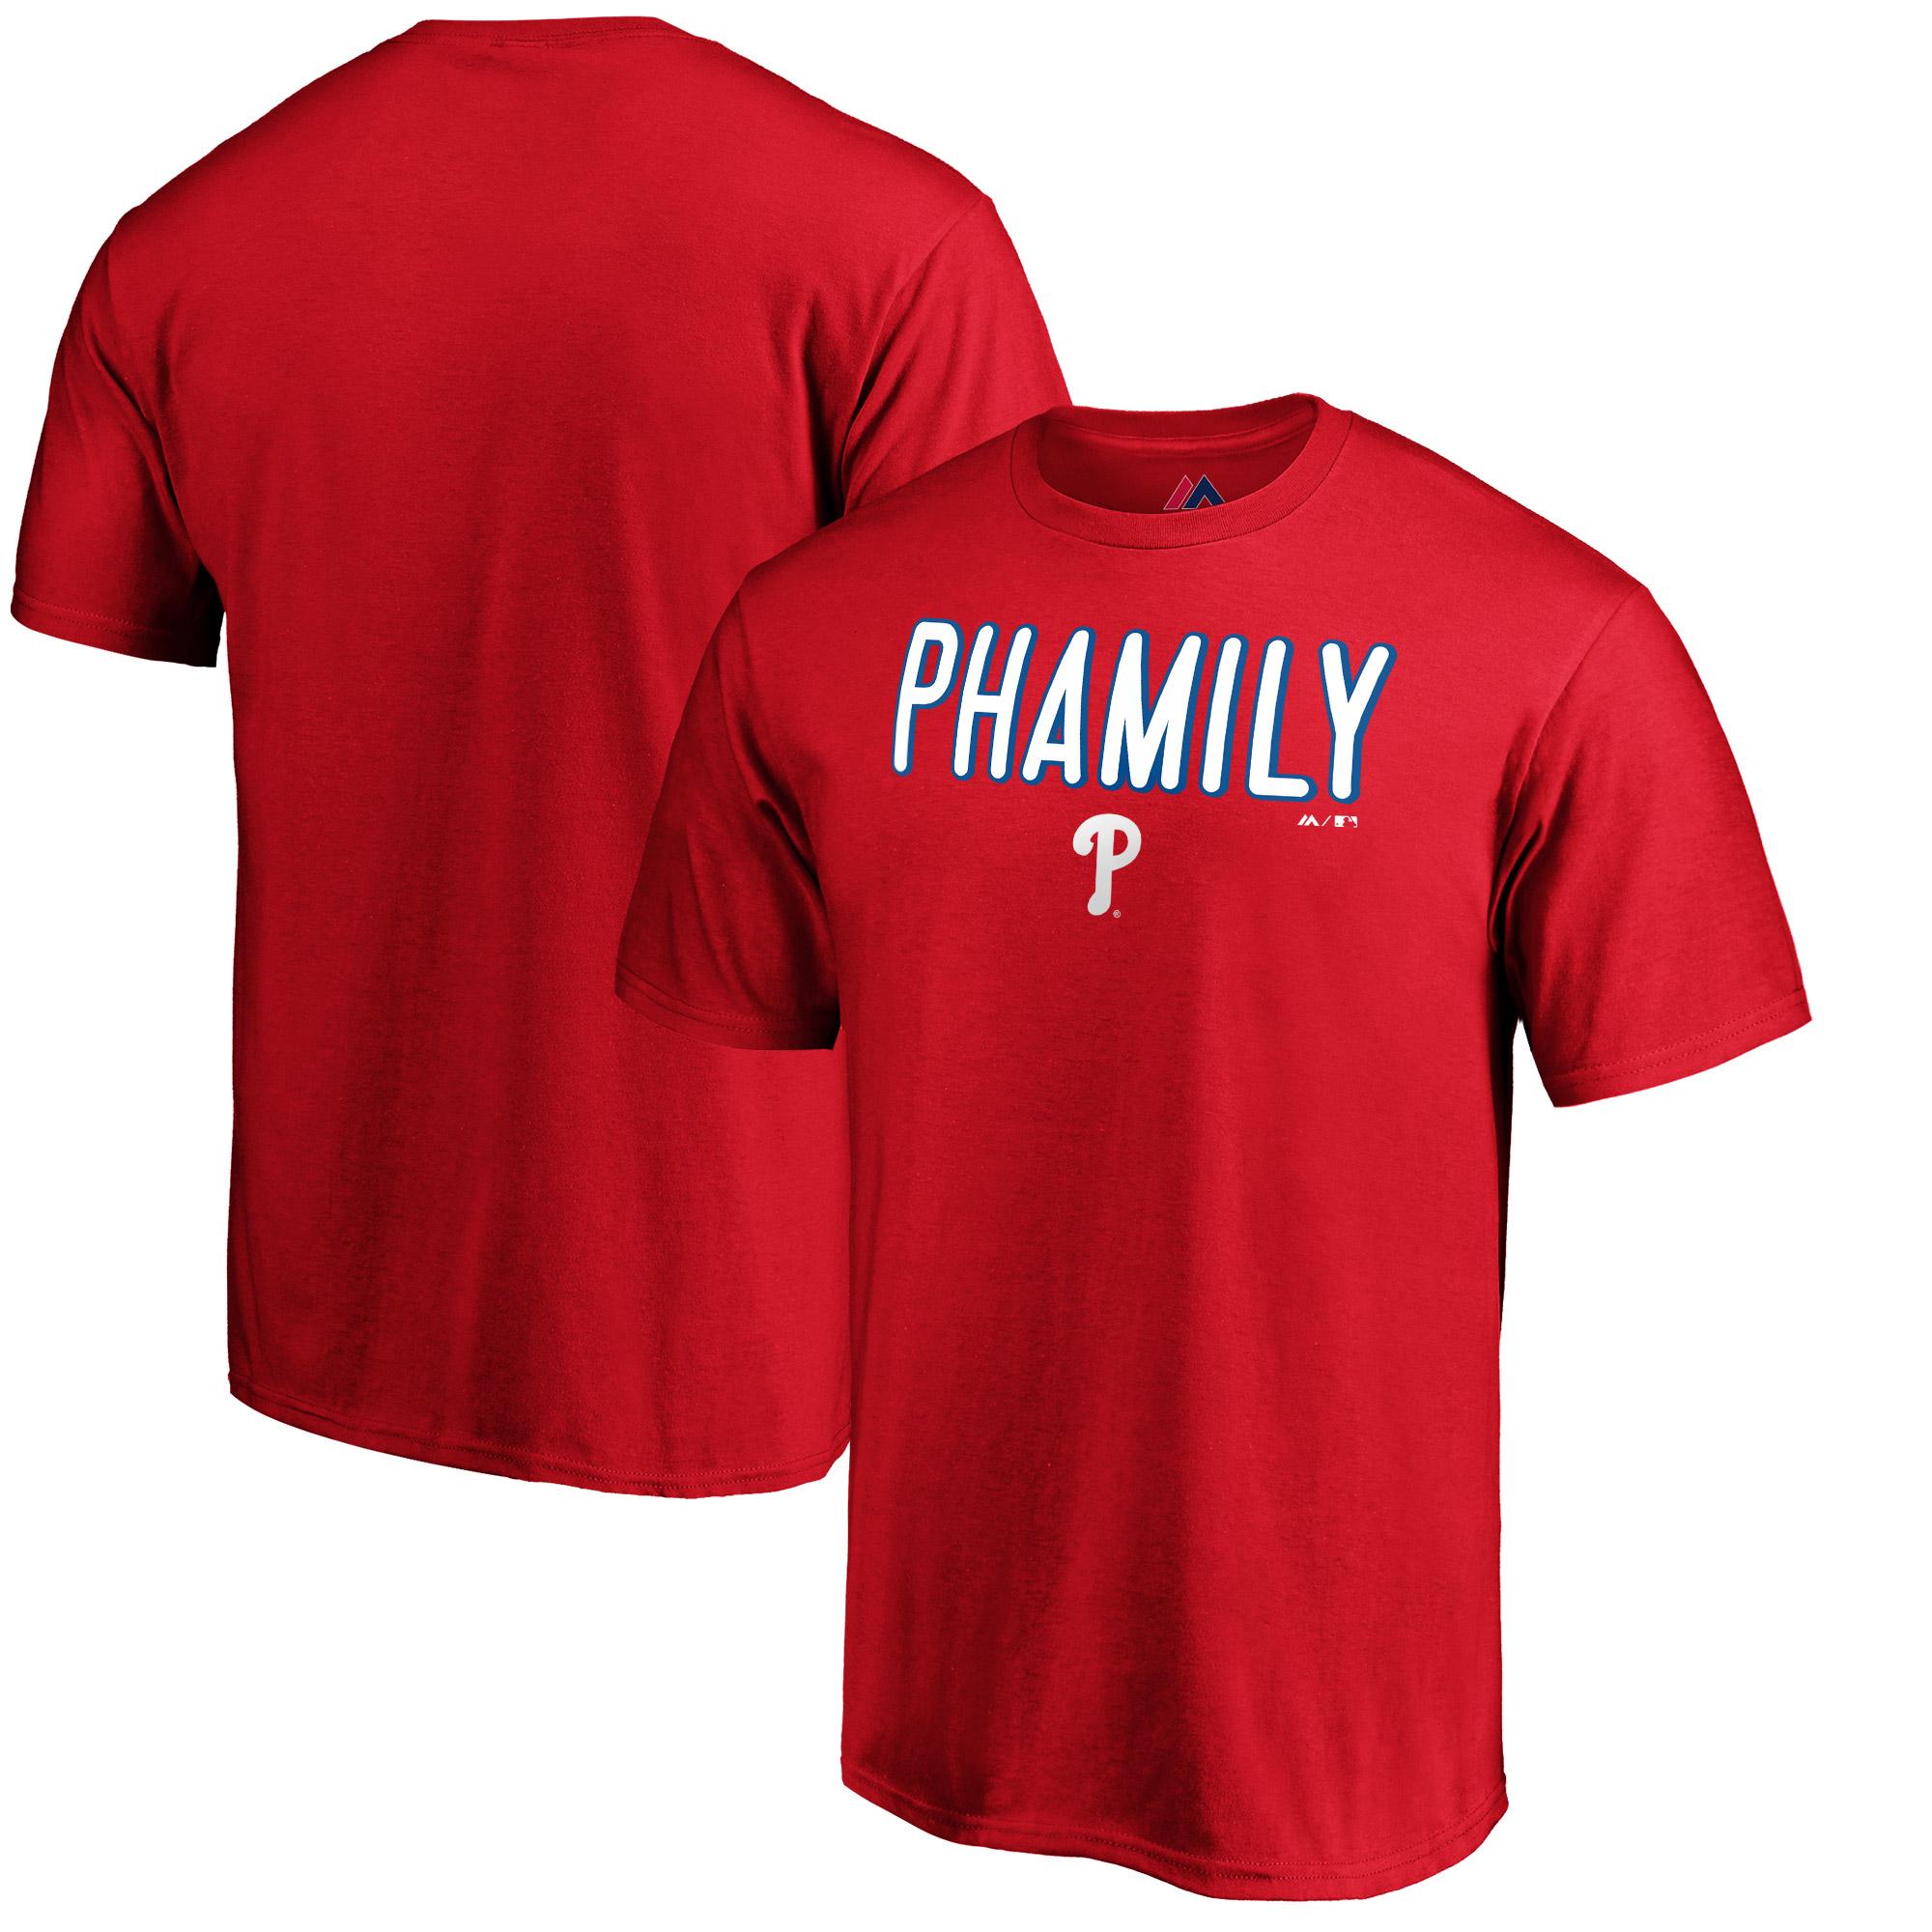 Bryce Harper Philadelphia Phillies Majestic Hometown Philly Pham T-Shirt - Red